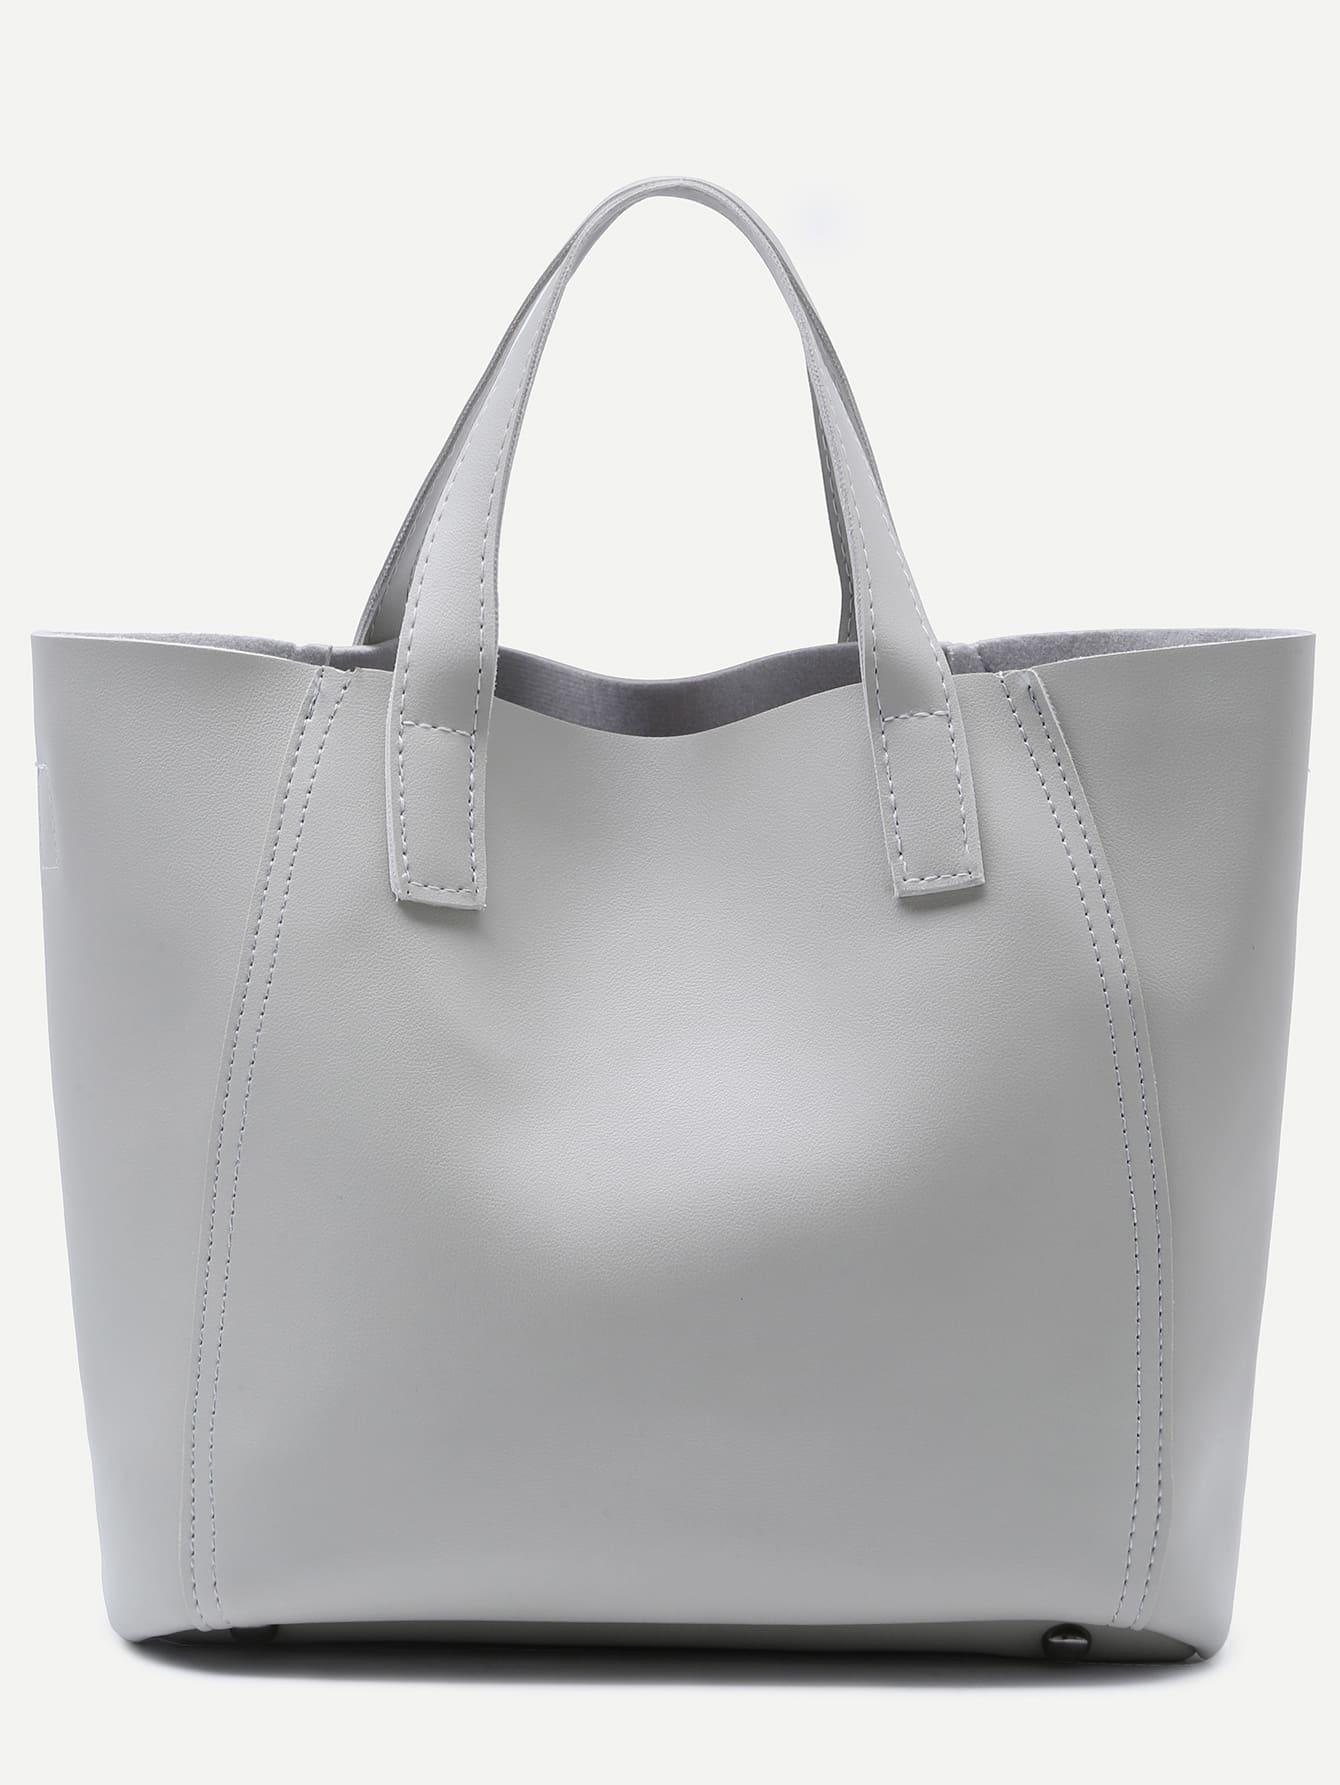 bag160825917_2